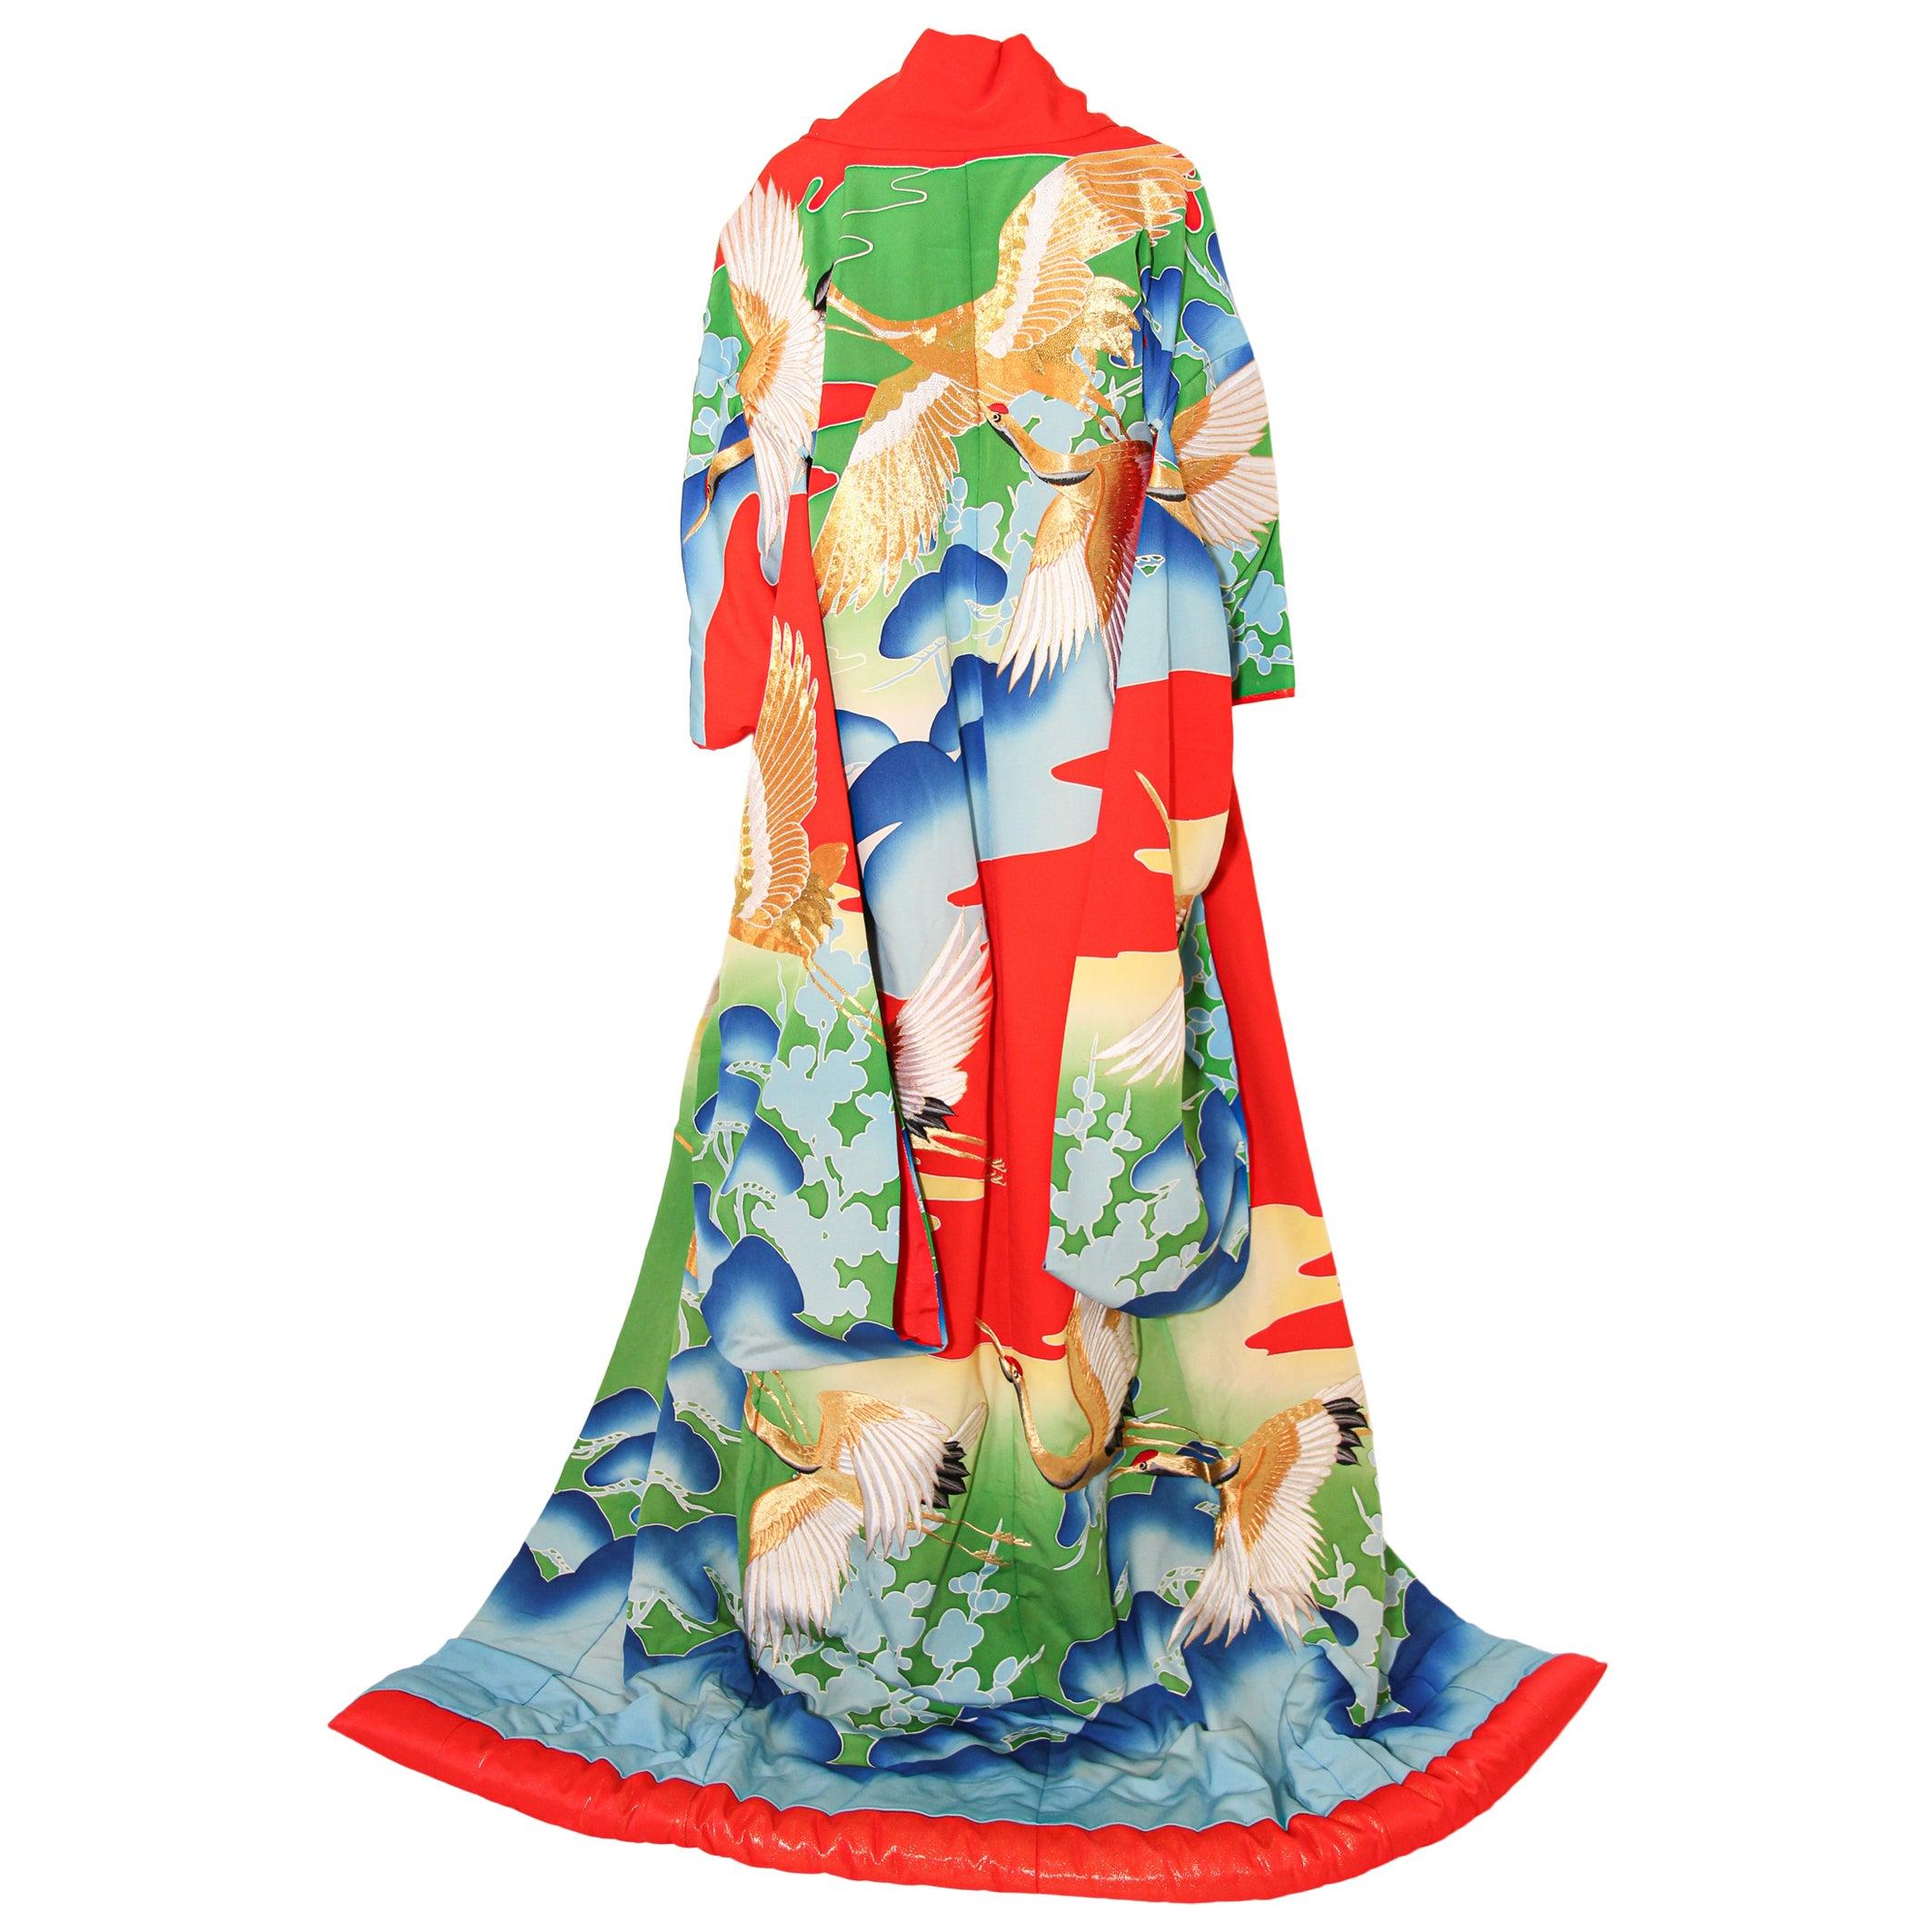 Vintage Collectable Japanese Ceremonial Kimono